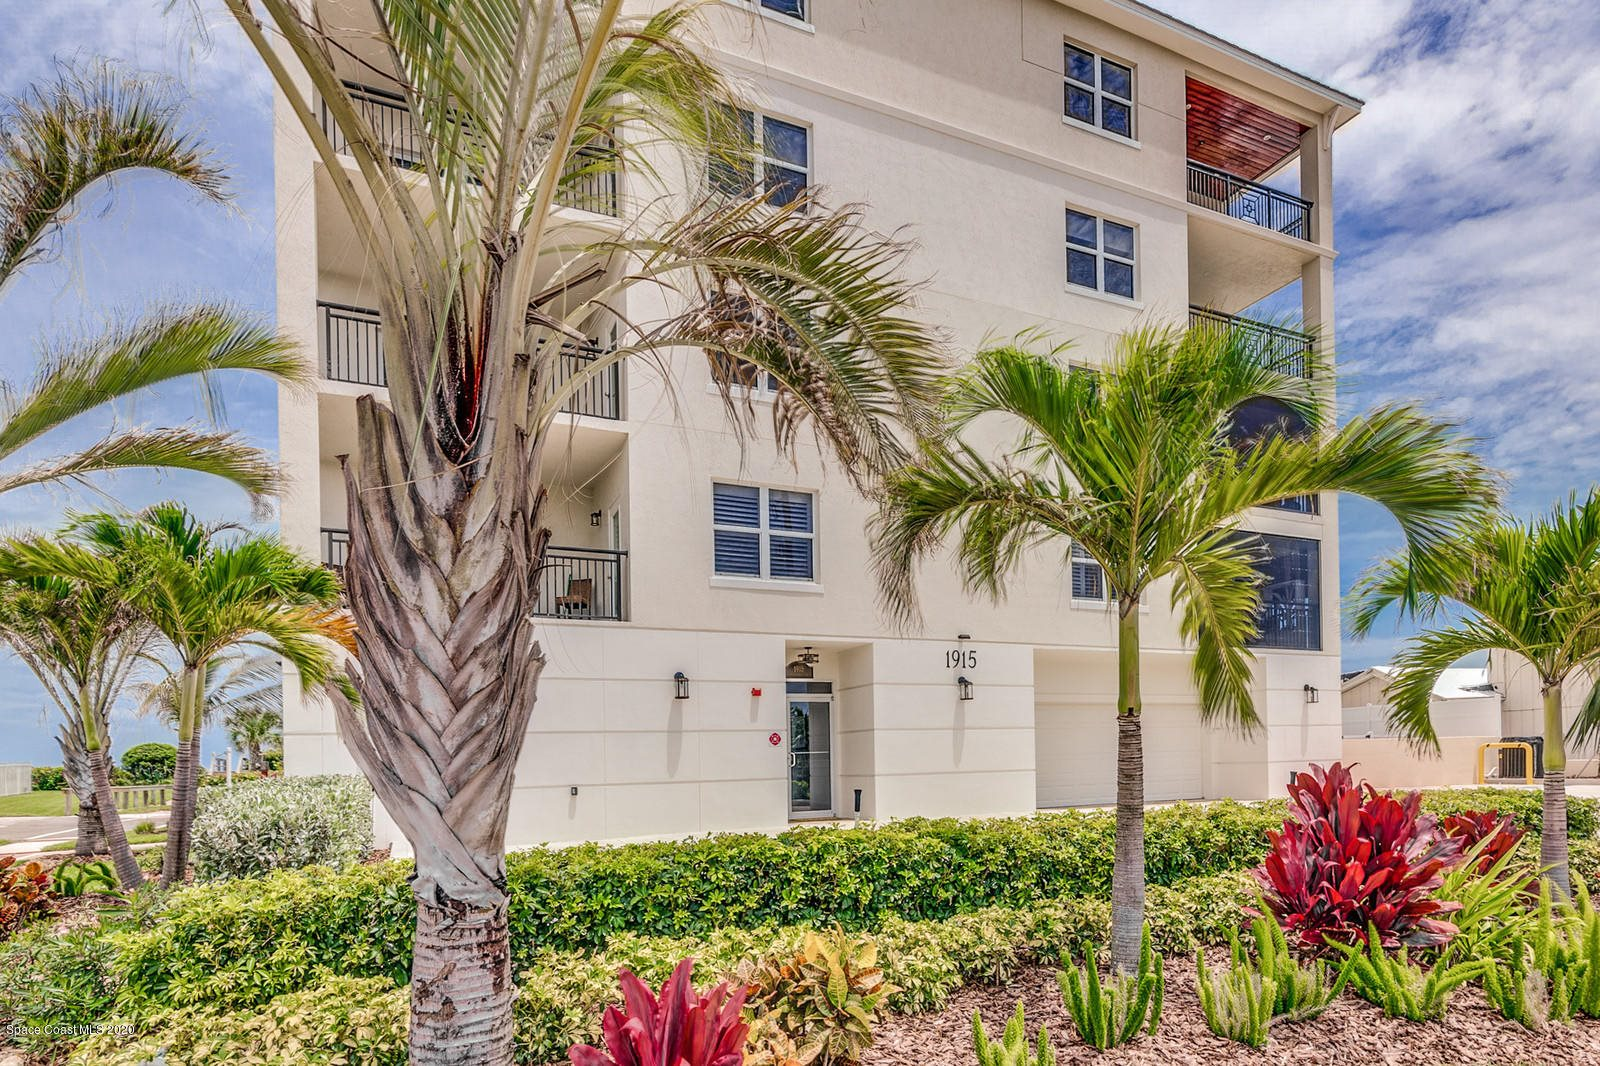 1915 South Atlantic Avenue, #202, Cocoa Beach, FL 32931